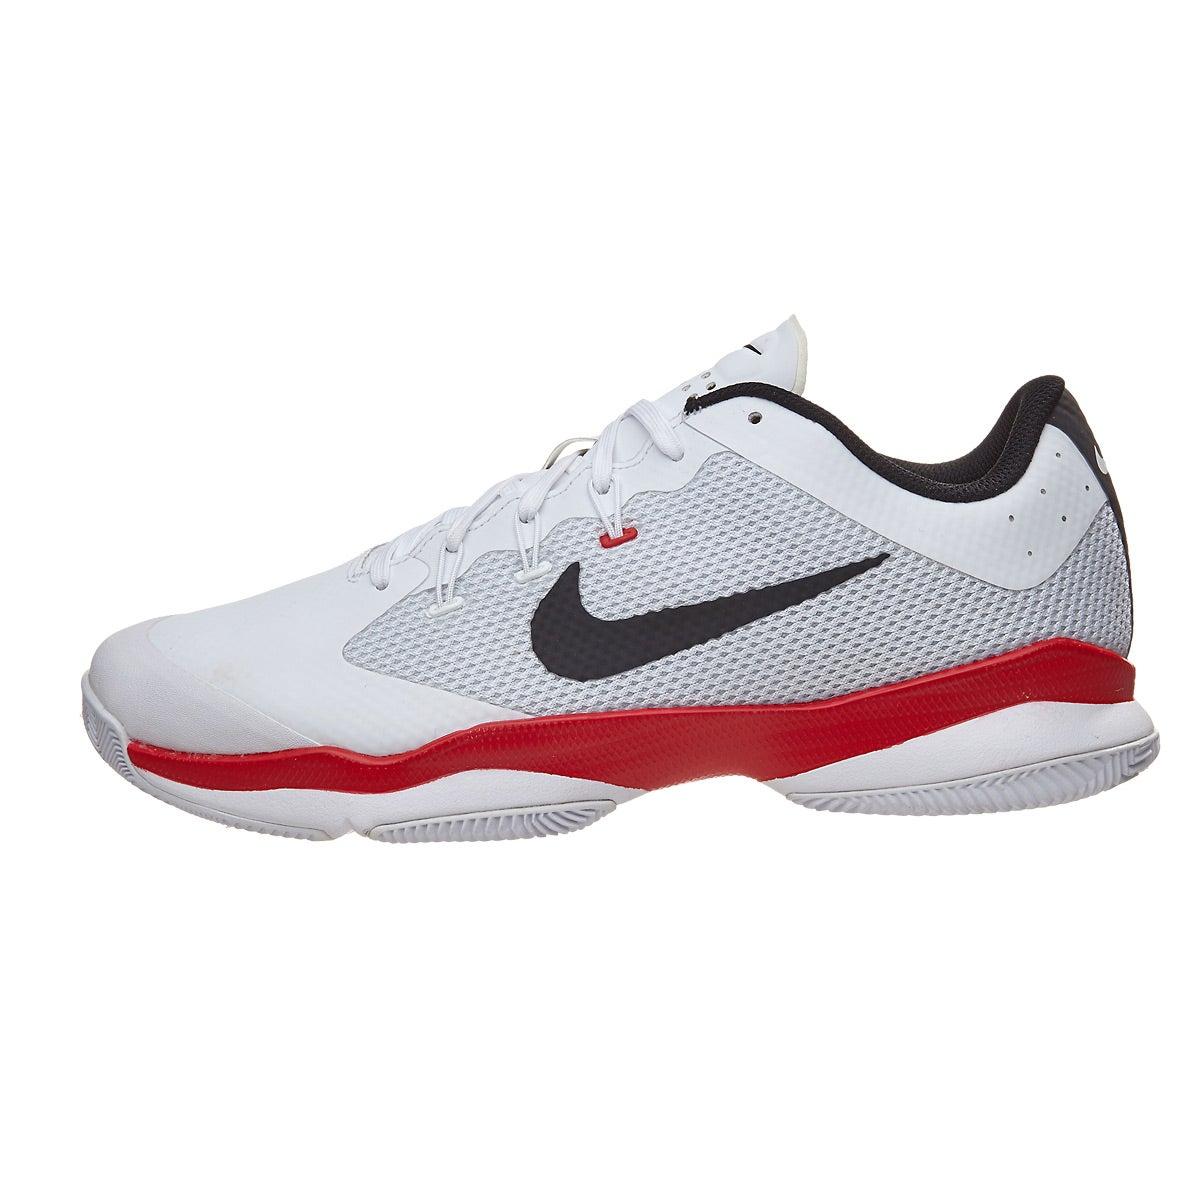 Nike Air Zoom Ultra White Black Red Men S Shoe 360 176 View